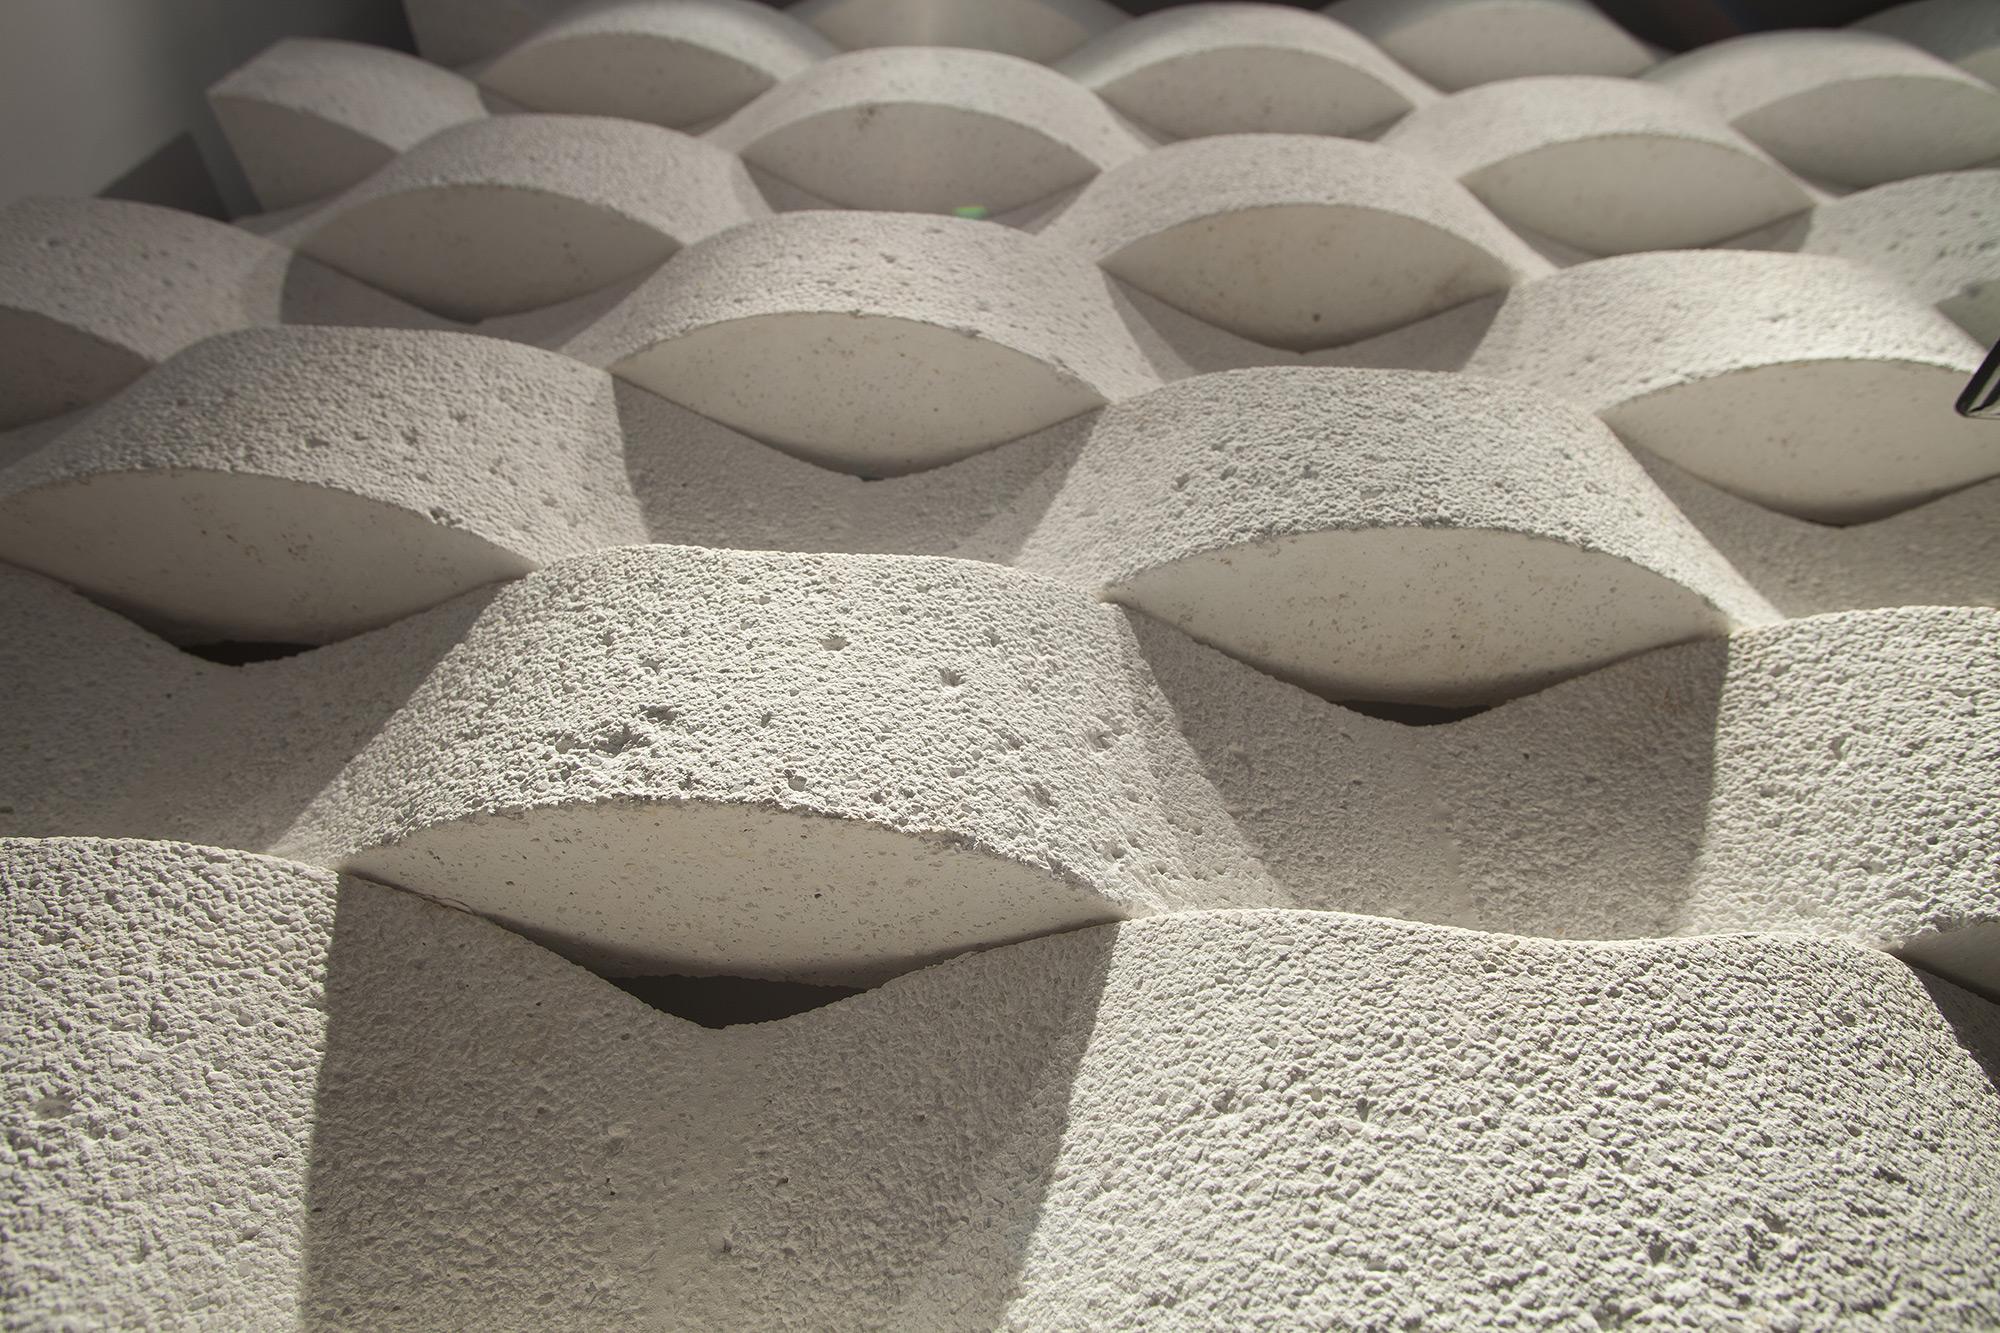 Trama Branco - Arquiteta Renata Amado - Mostra Polo Design